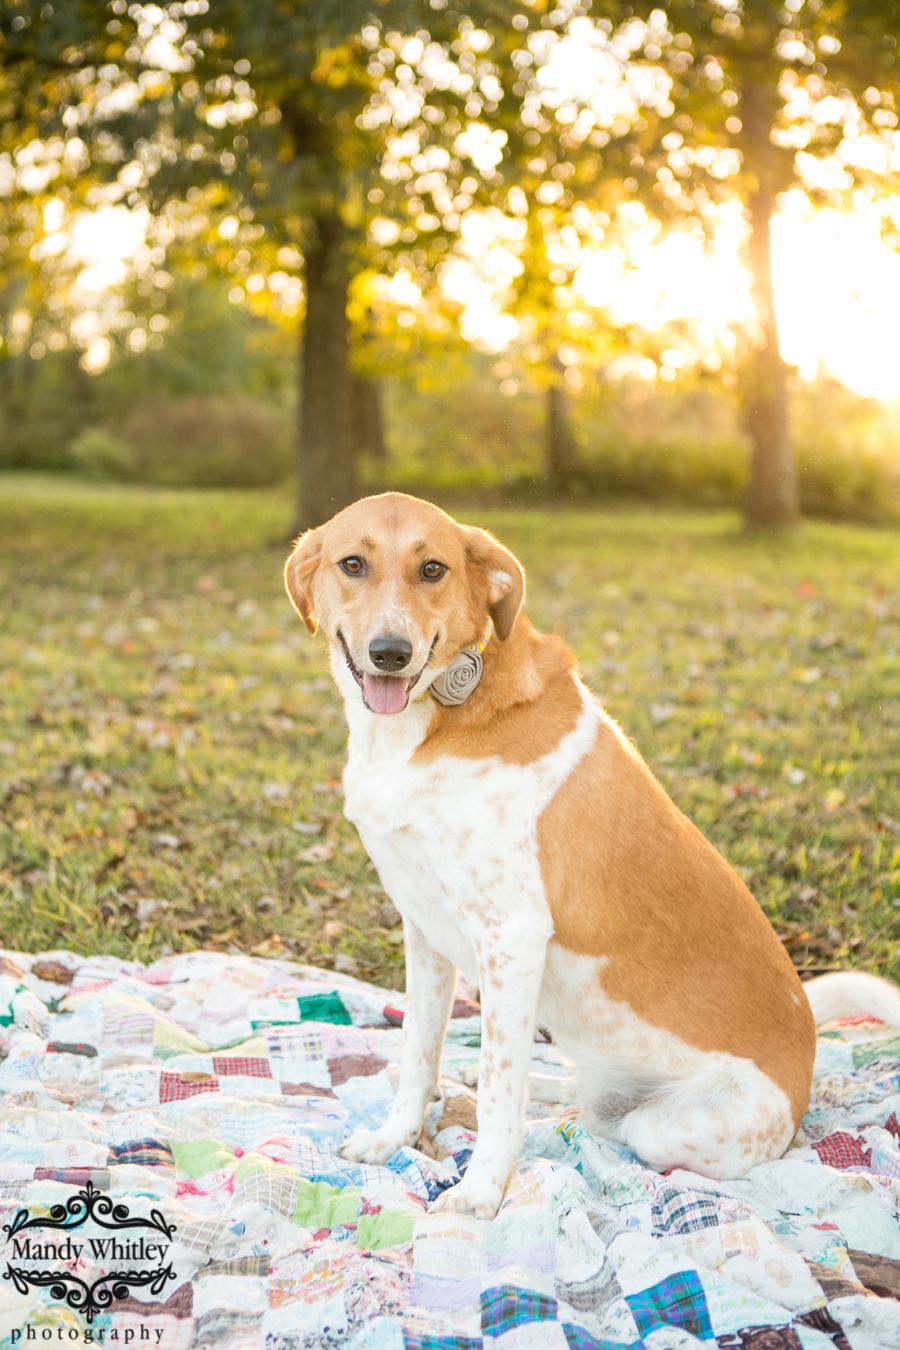 Nashville Family Pet Photographer | Mandy Whitley Photography